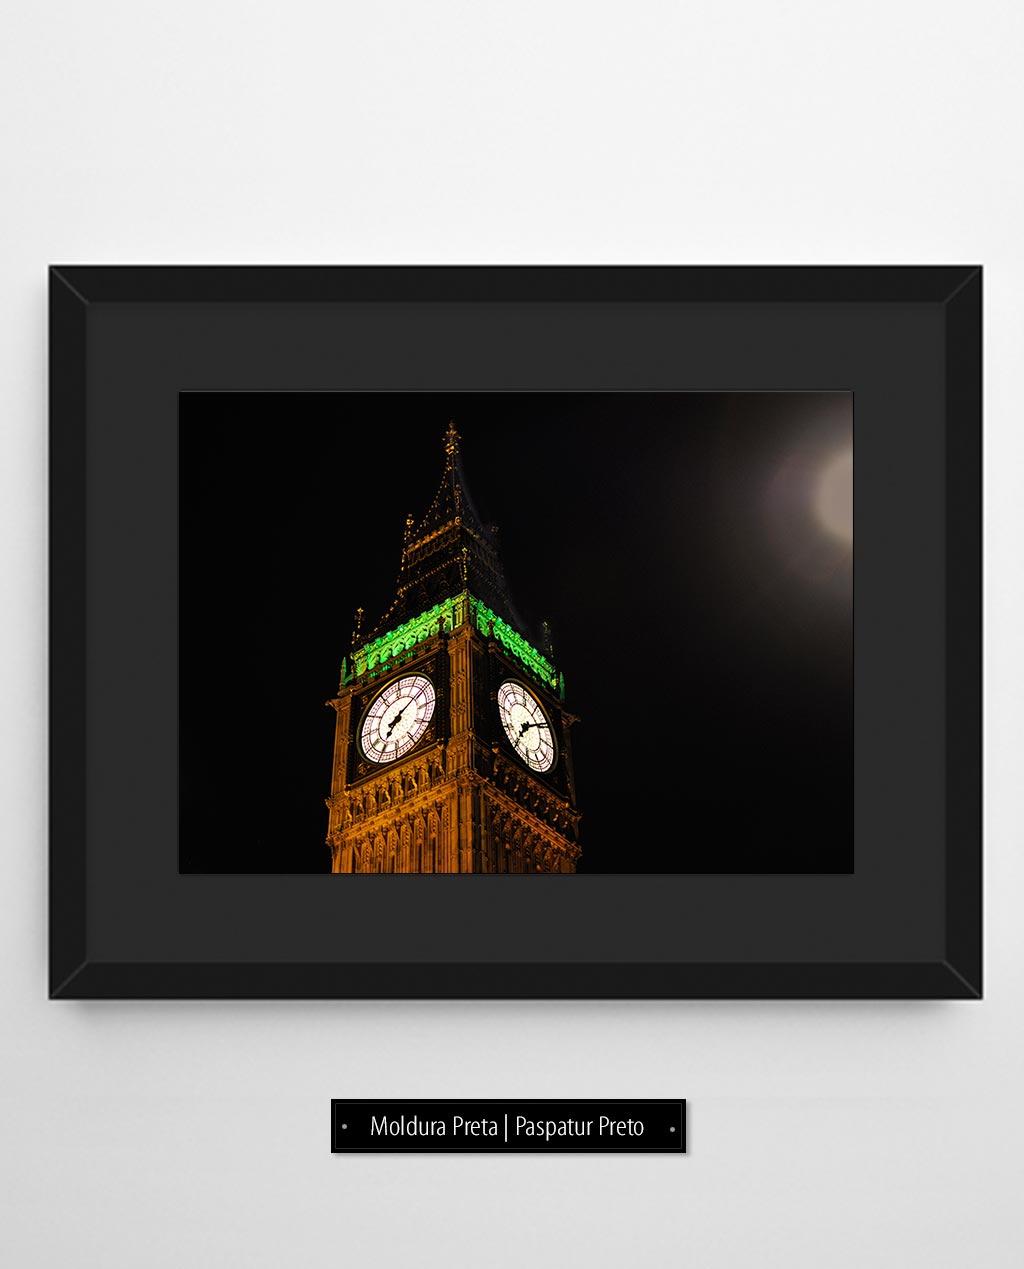 Big Ben e a noite preta   Londres - Inglaterra (LICH)